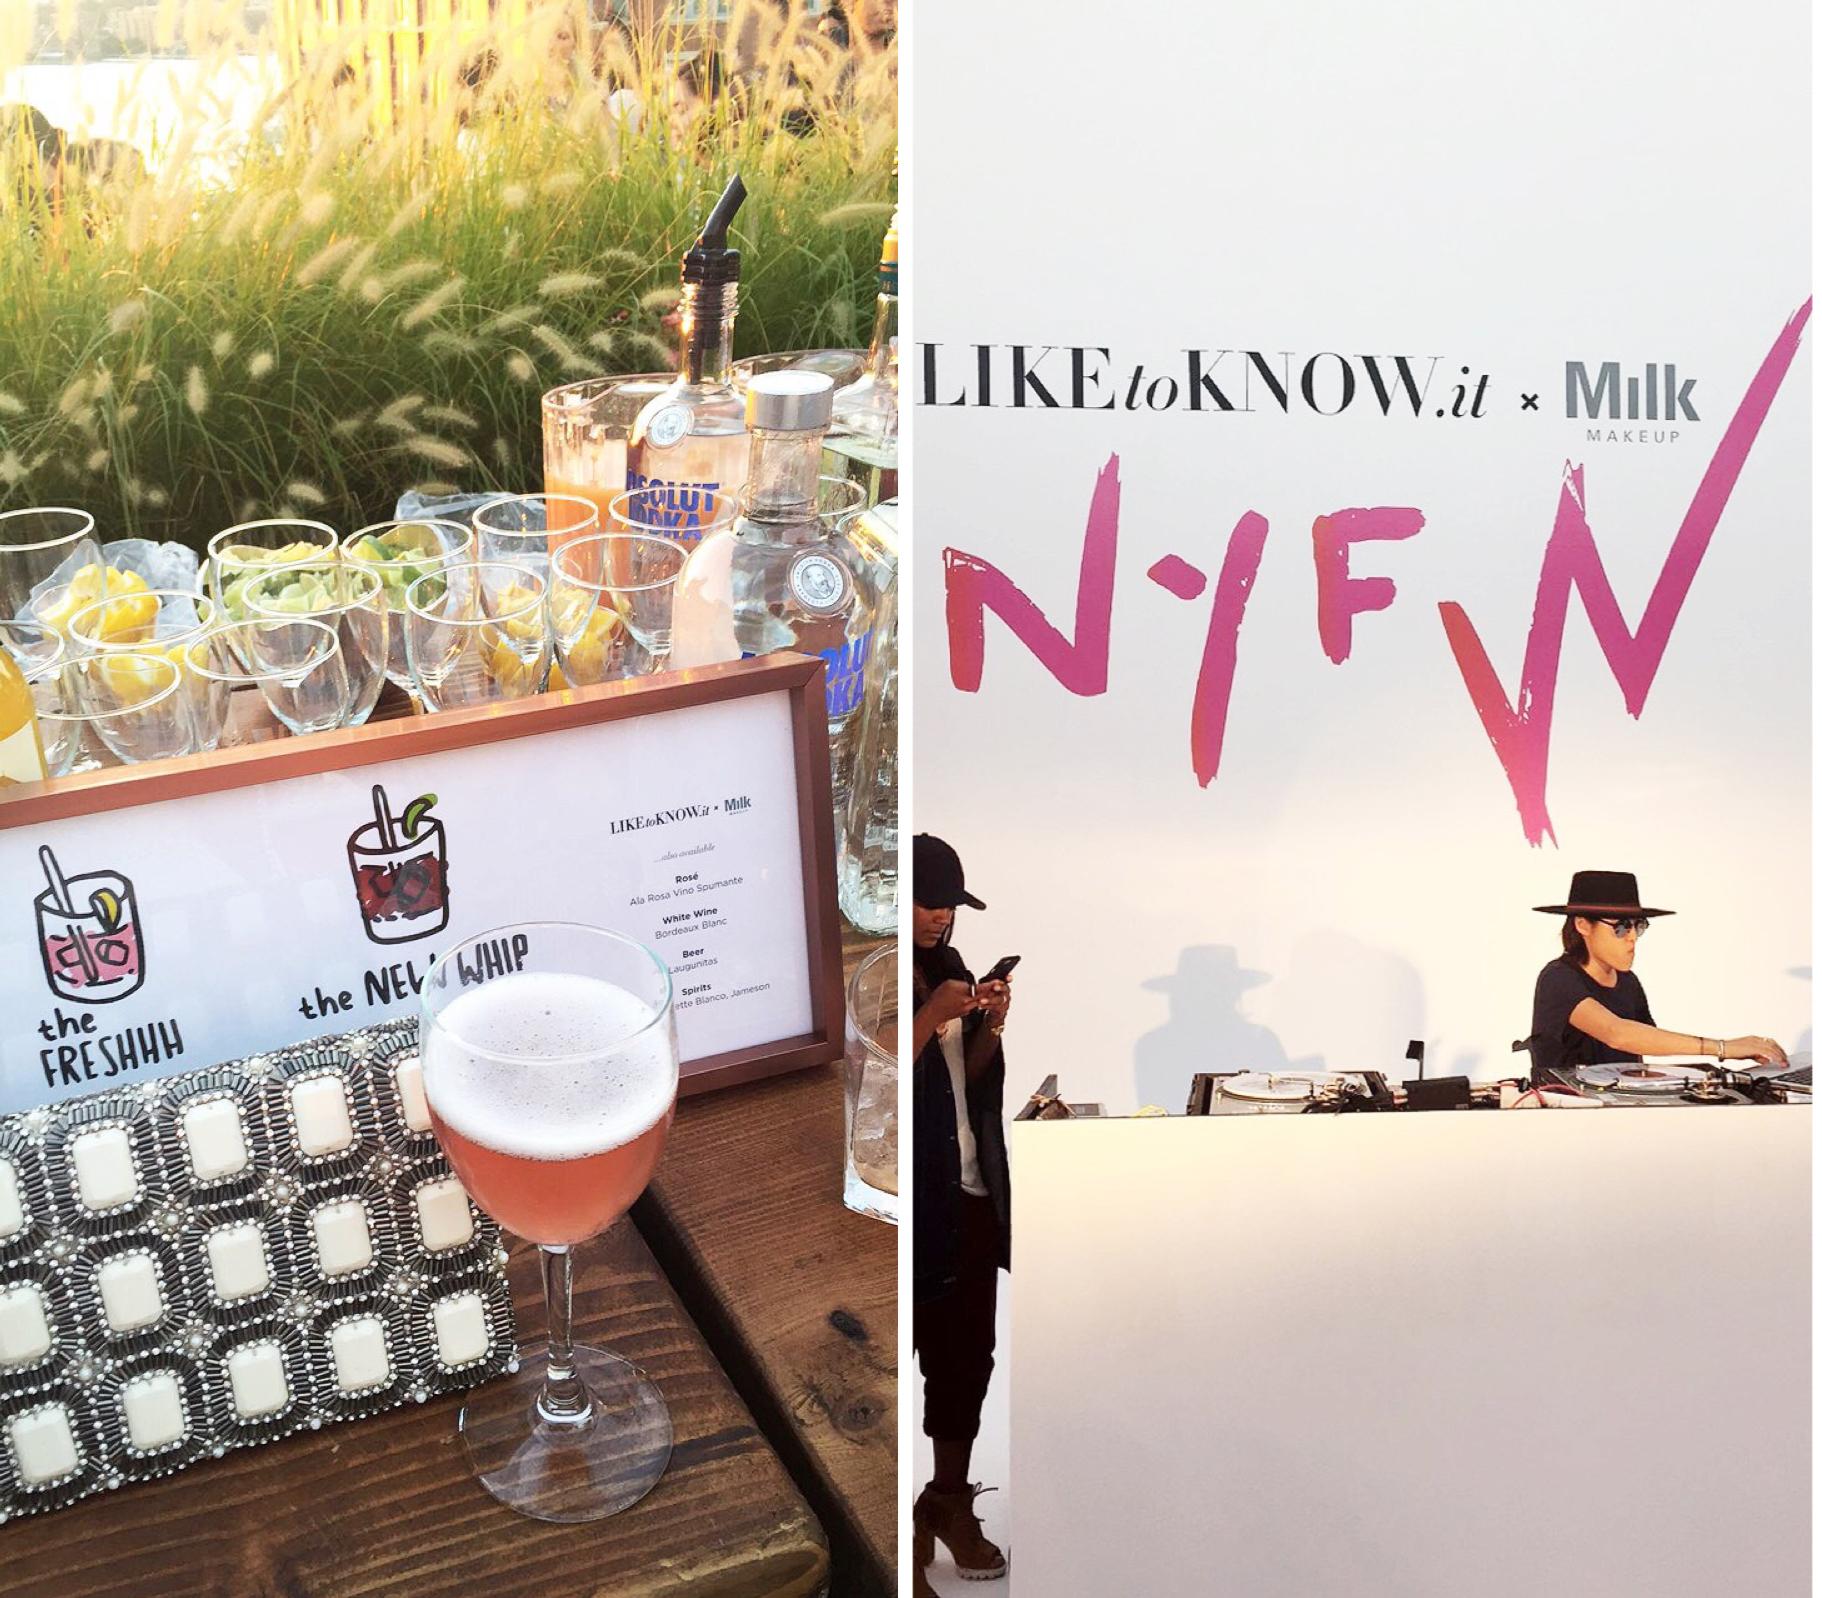 erie-nick-nyfw-events